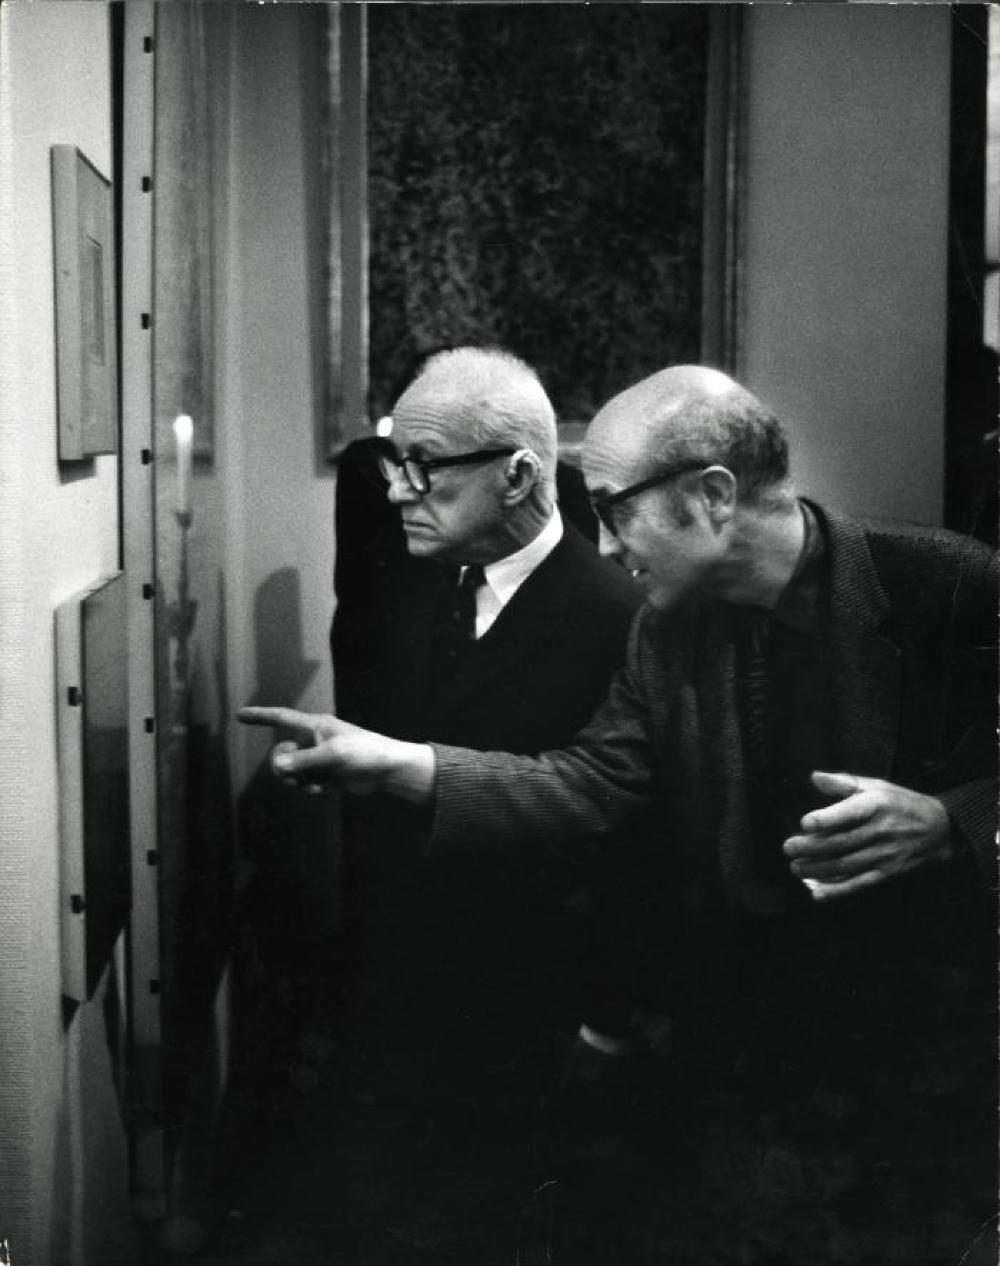 Isamu Noguchi with Buckminster Fuller